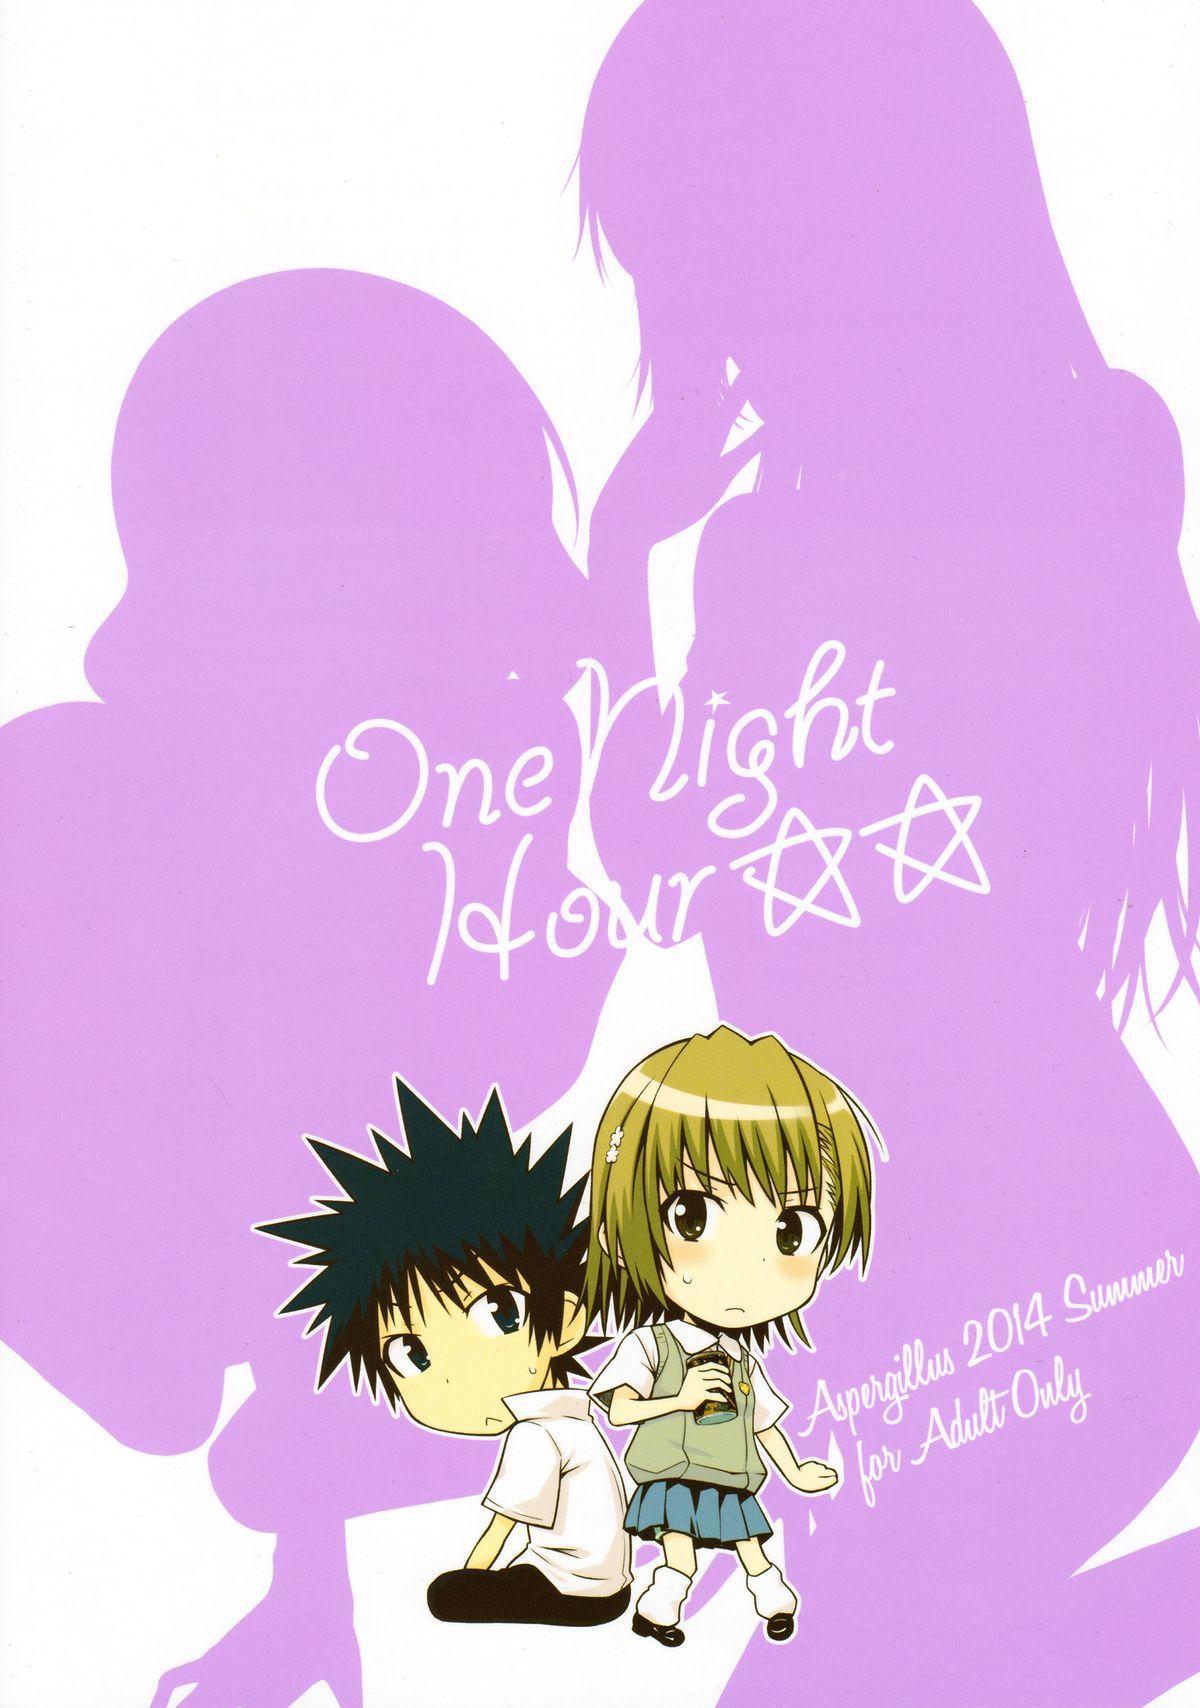 One Night Hour 23